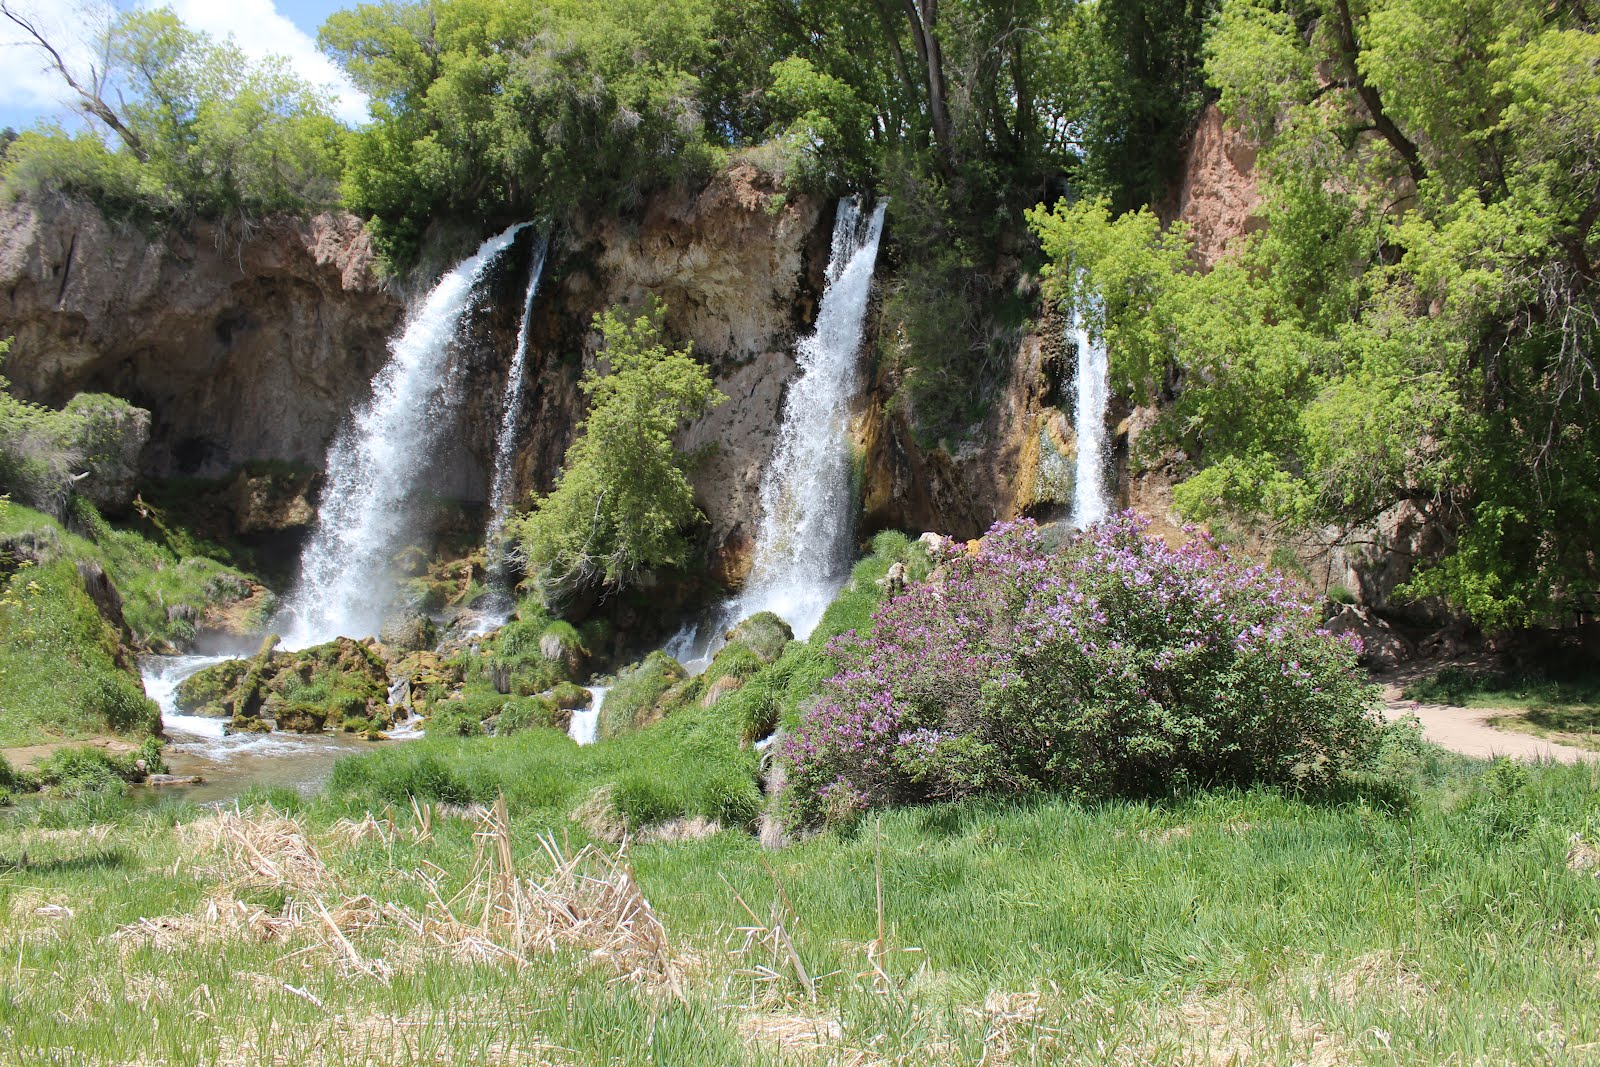 gjhikescom Rifle Falls Coyote Trail